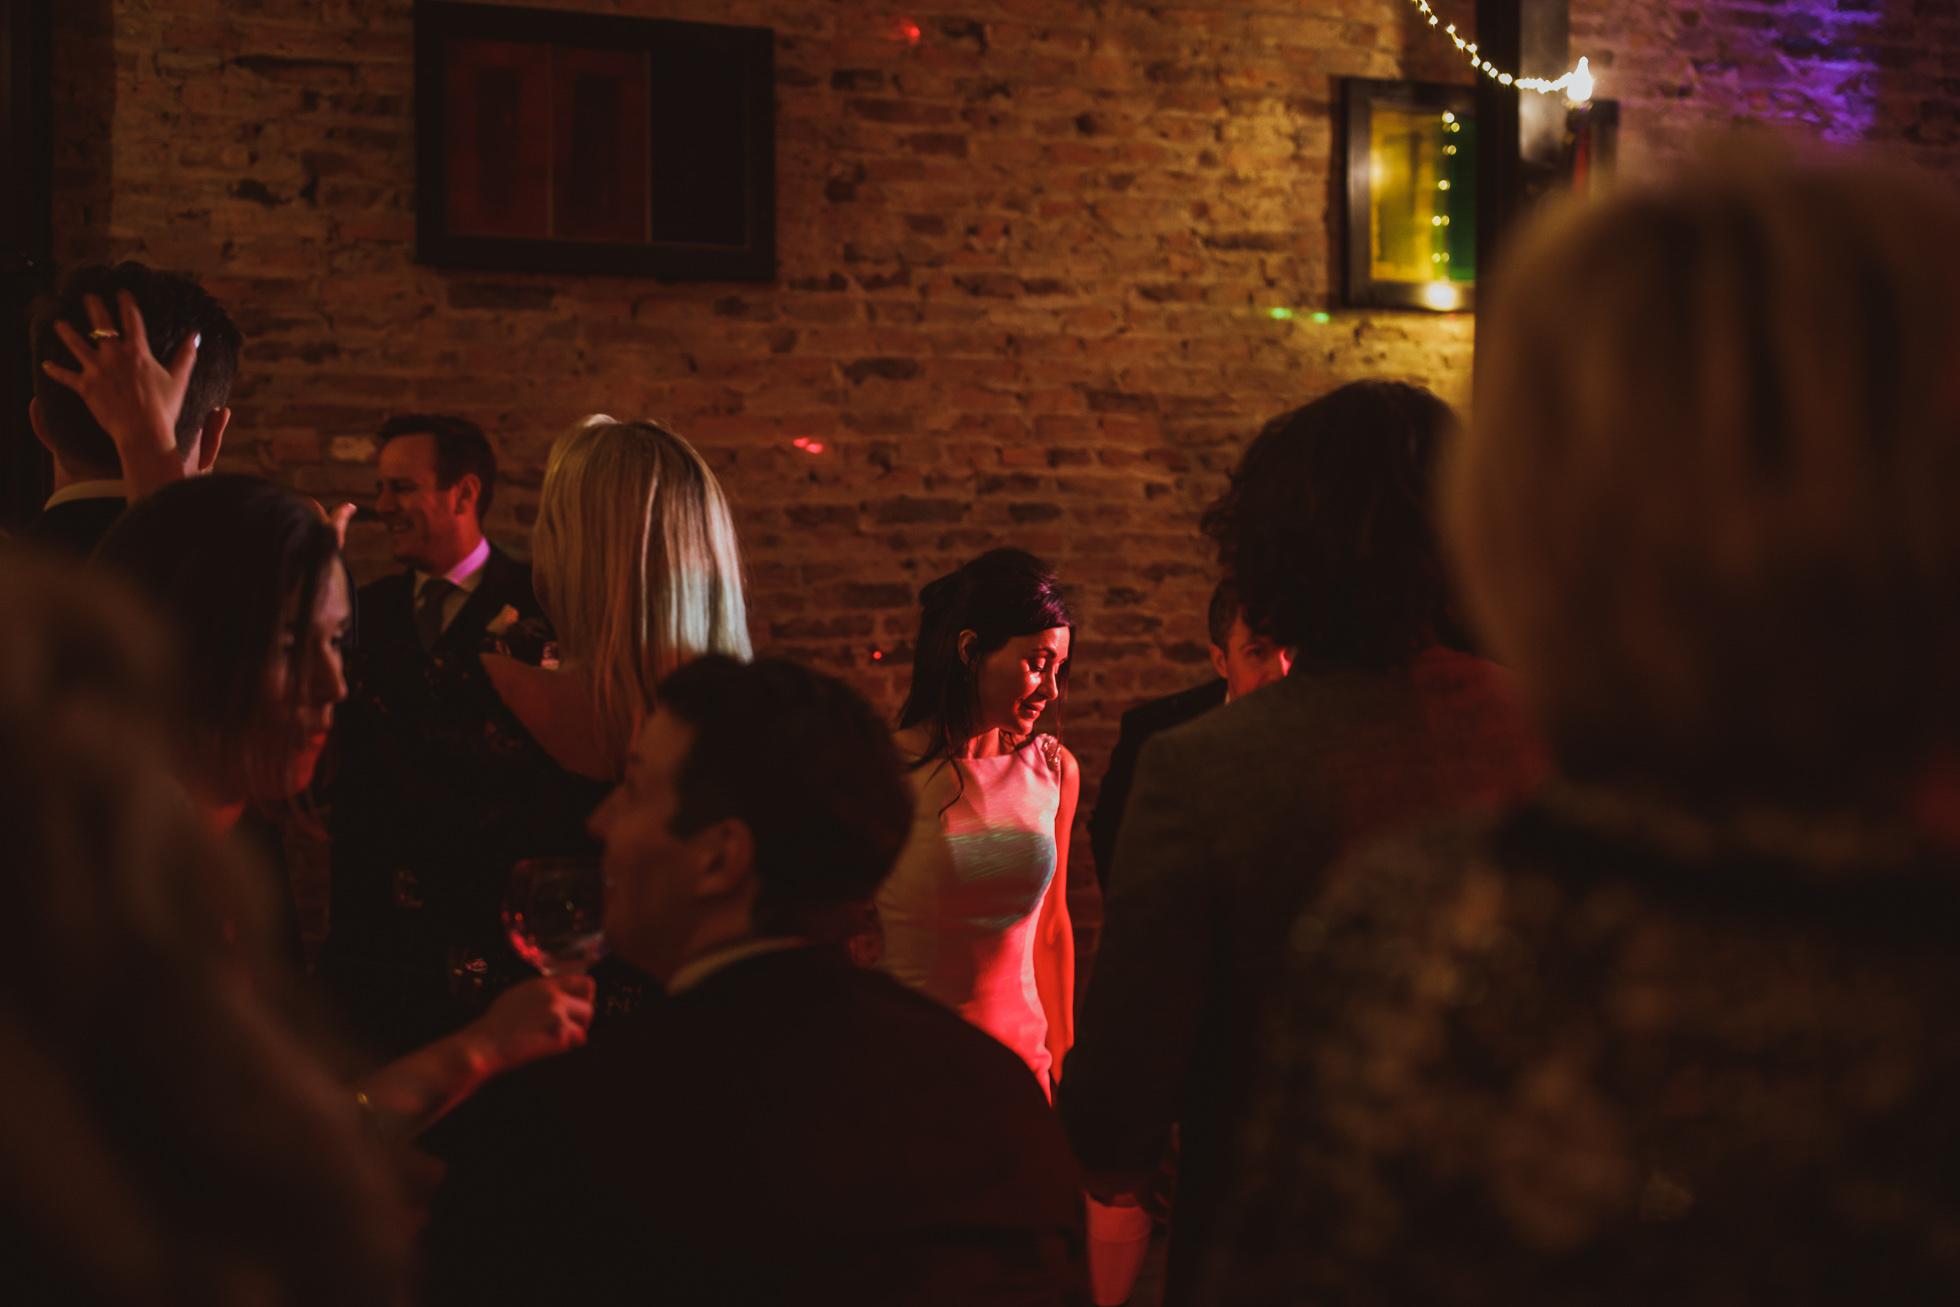 hornington_manor_wedding_photographer-134.jpg